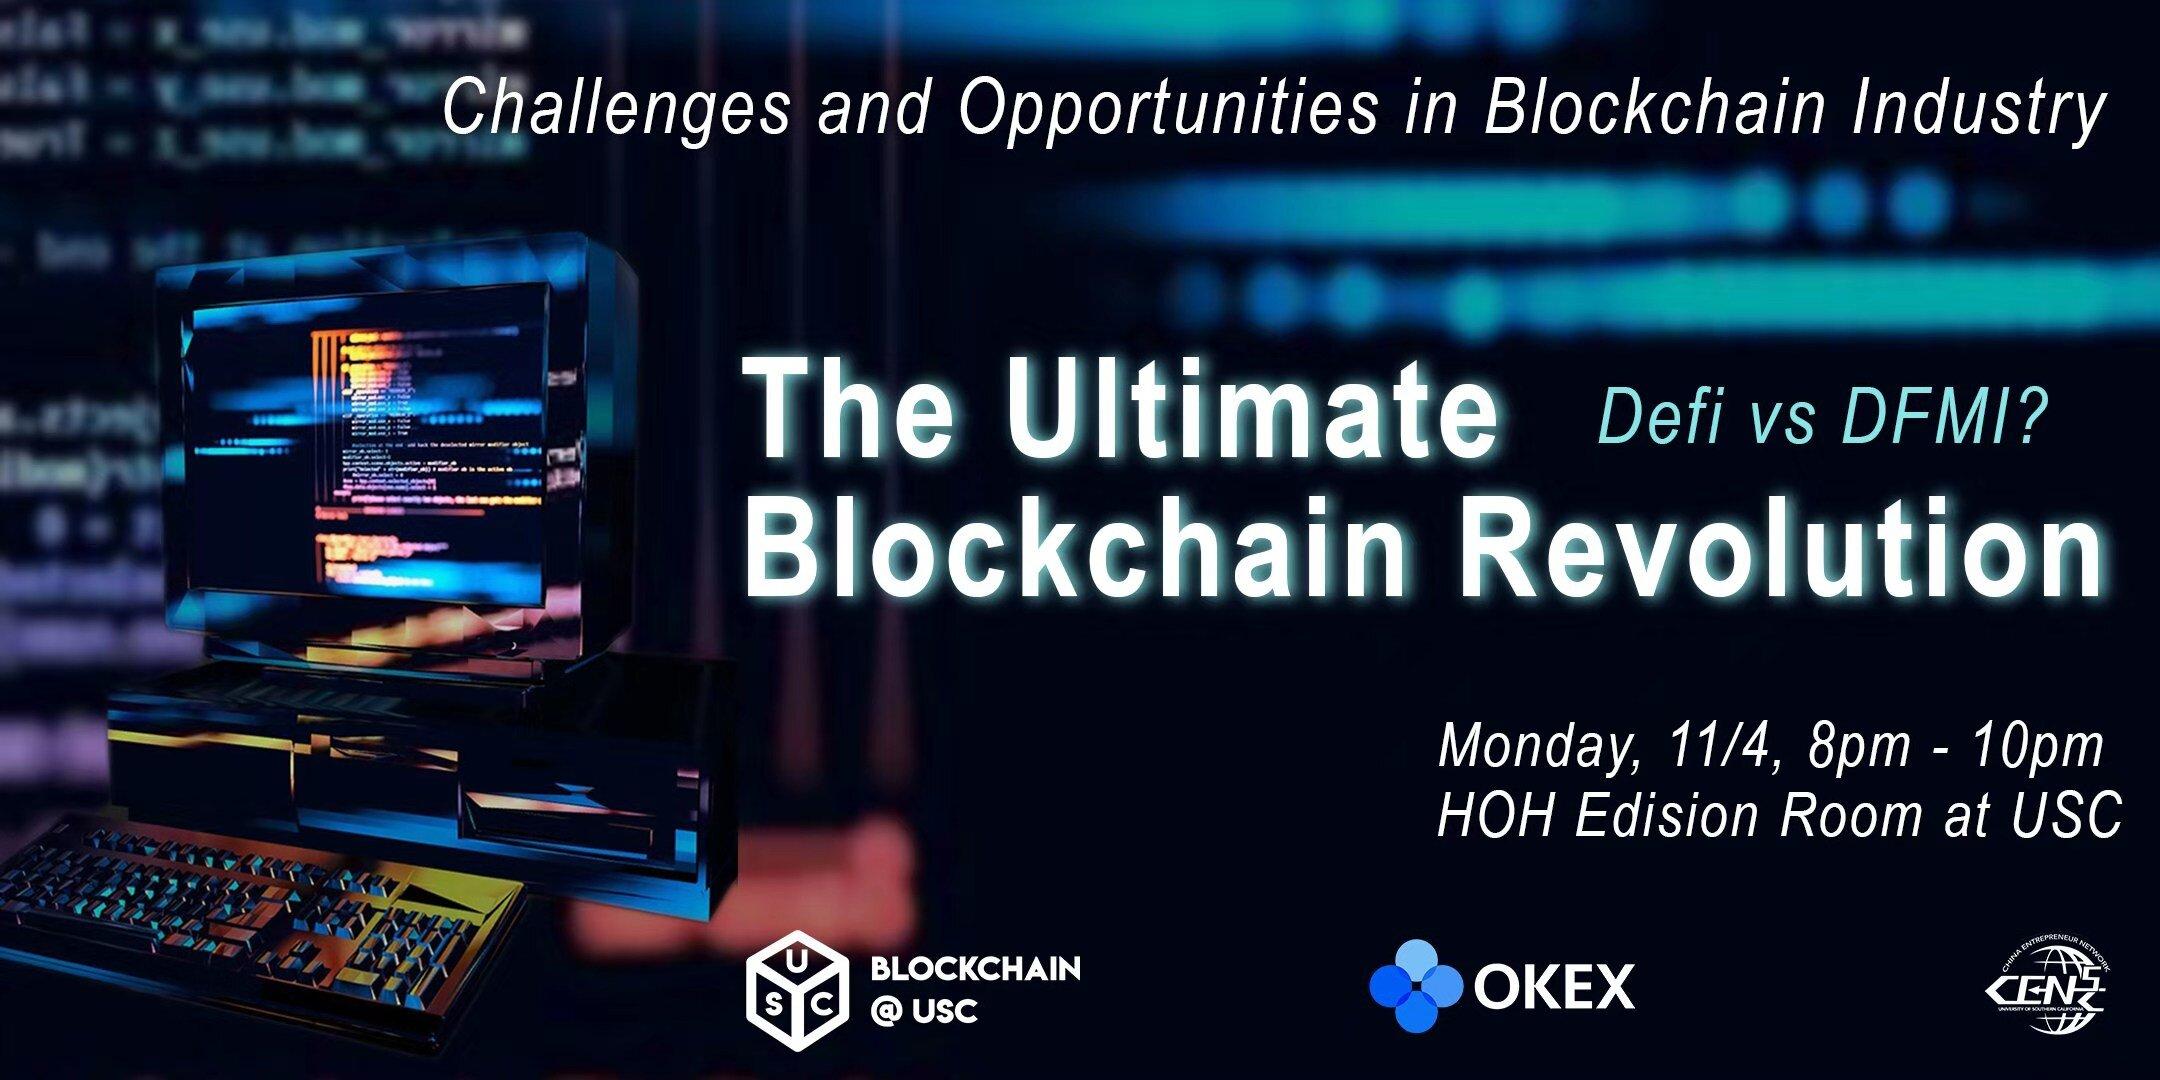 usc blockchain revolution.jpg